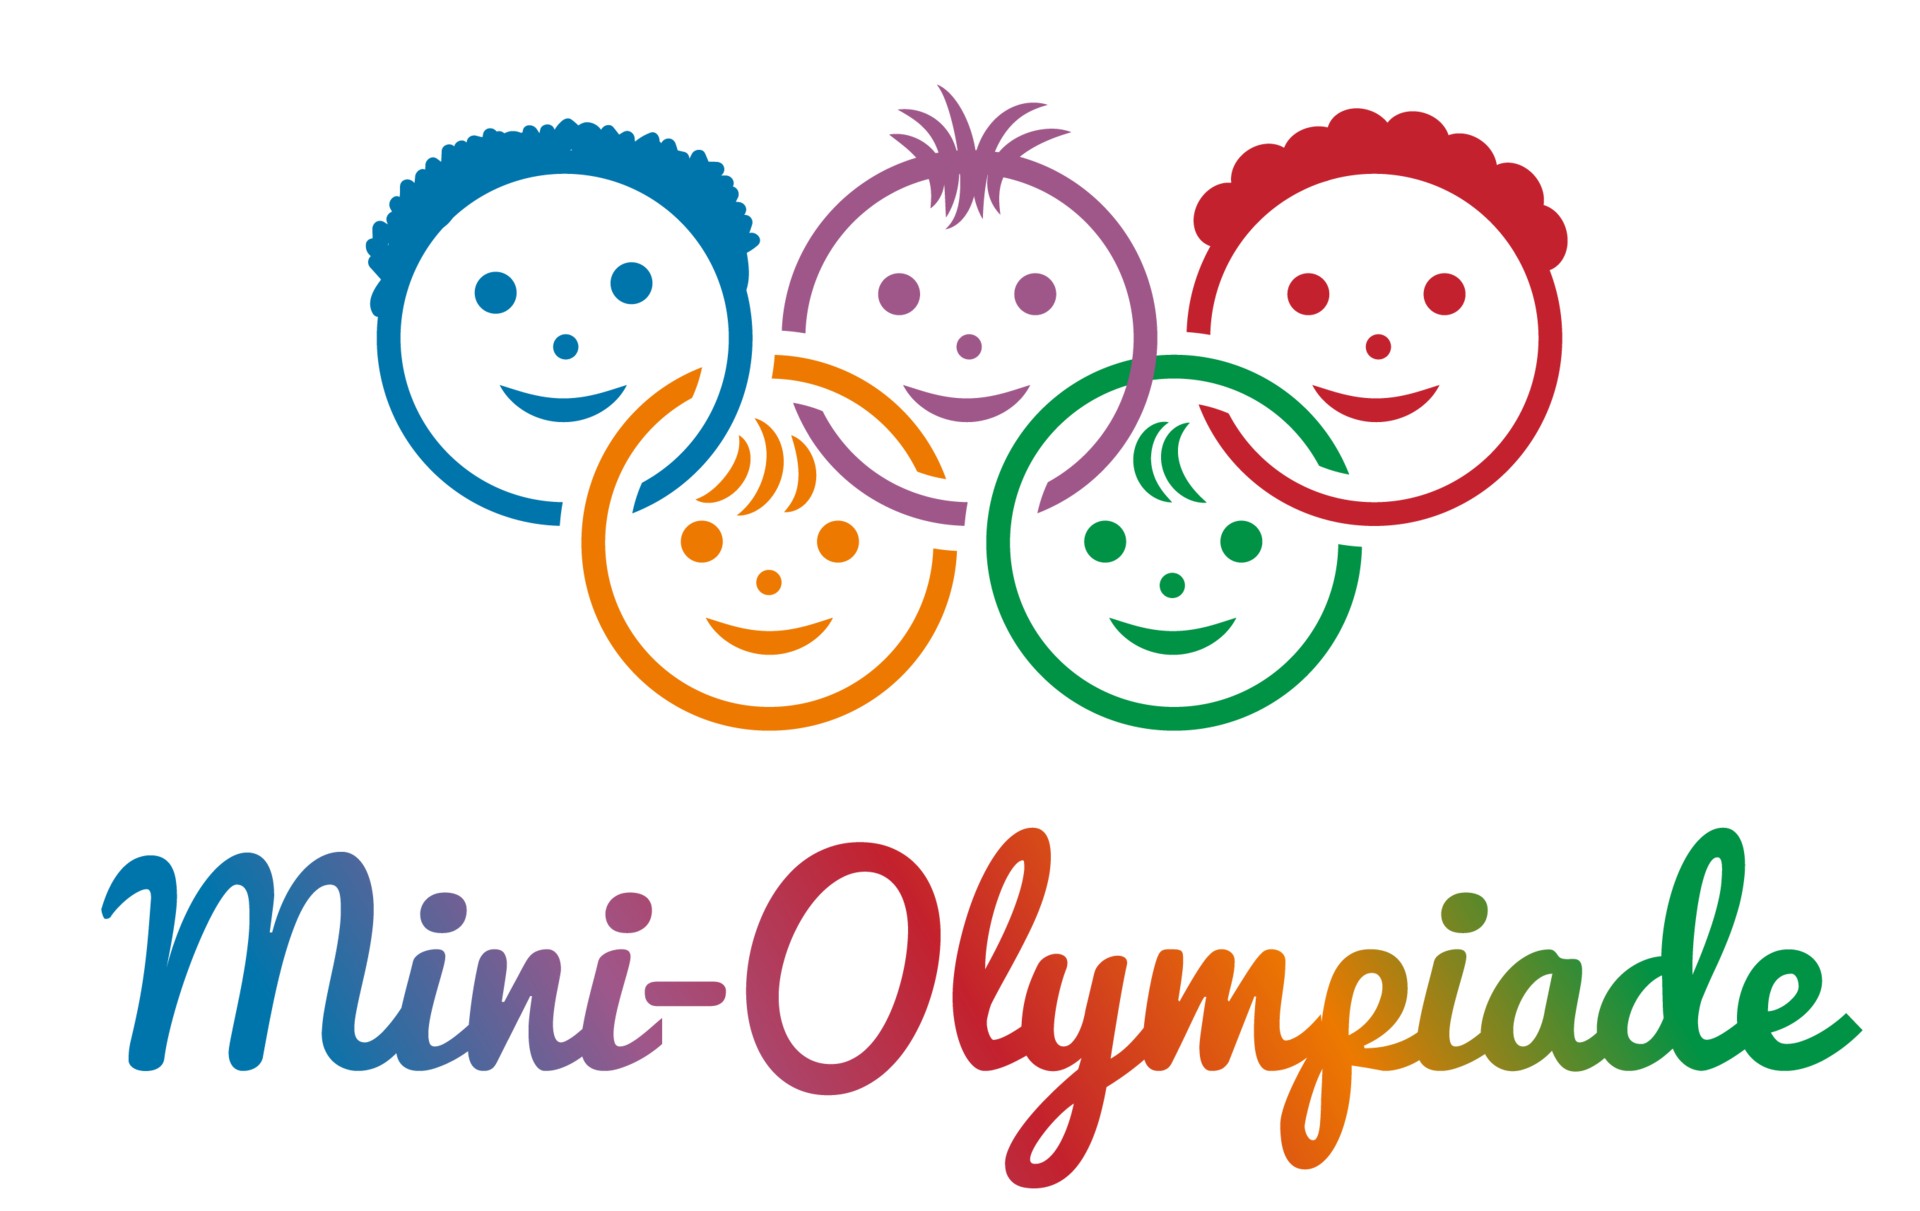 ksb_mini-olympiade_logo-font_screen-color_300dpi_2717x1713px_transparent